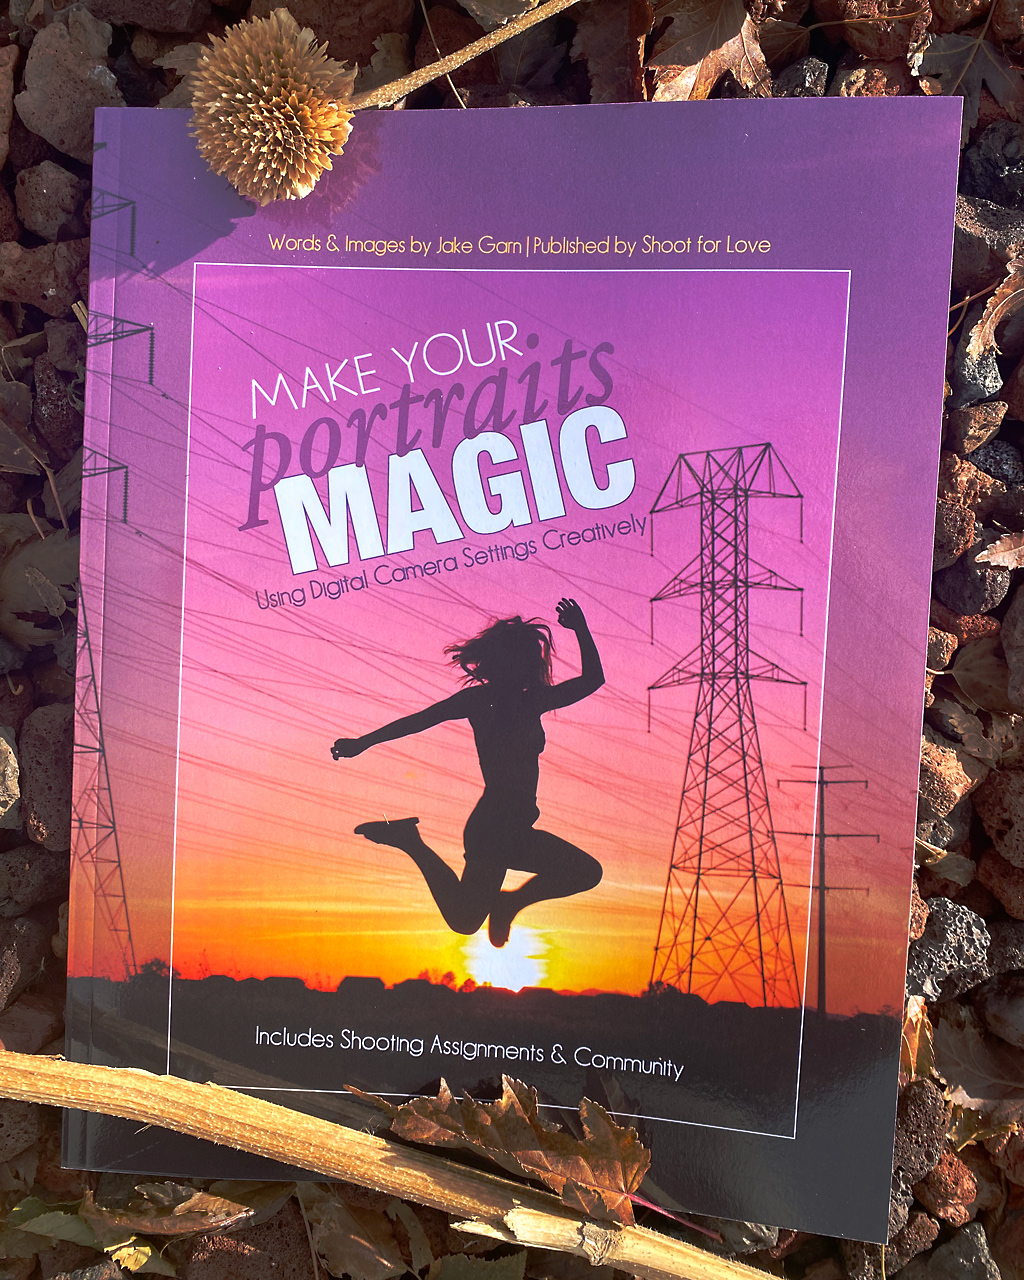 Make Your Portraits Magic: Using Digital Camera Settings Creatively